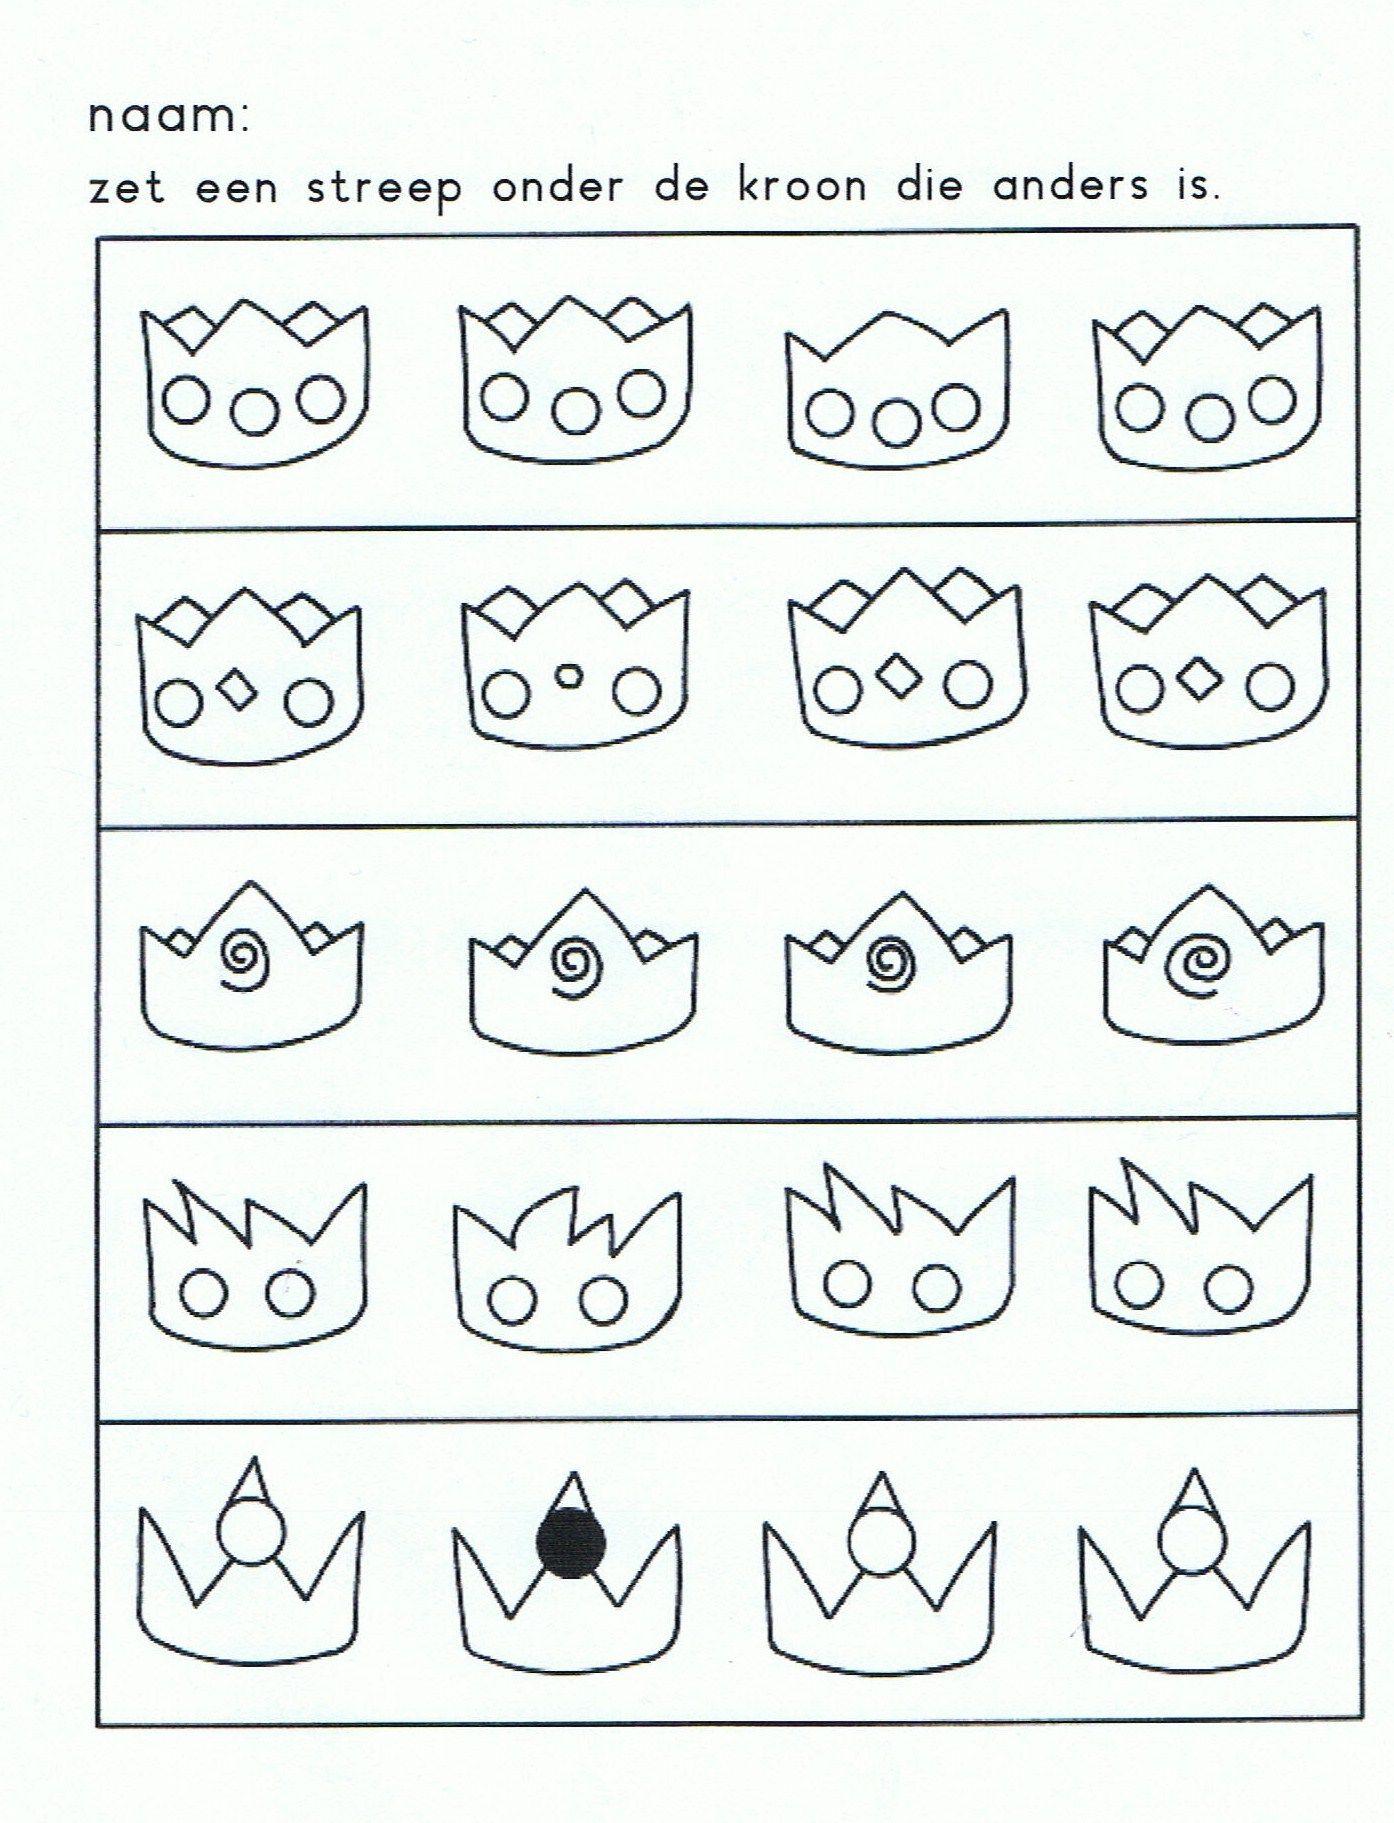 kronen | Ritter | Pinterest | Kronen, Arbeitsblätter und Königin